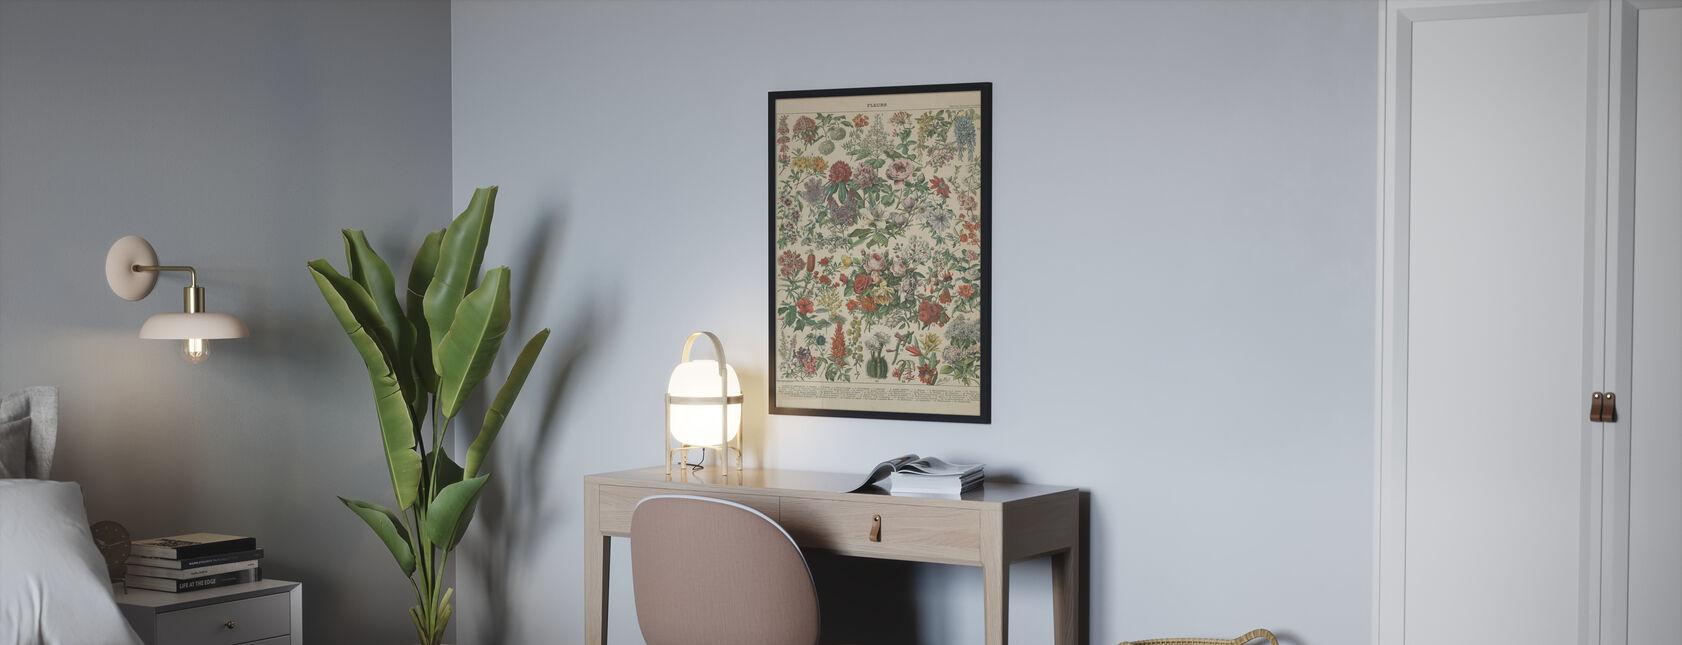 Grafico floreale francese - Poster - Camera da letto